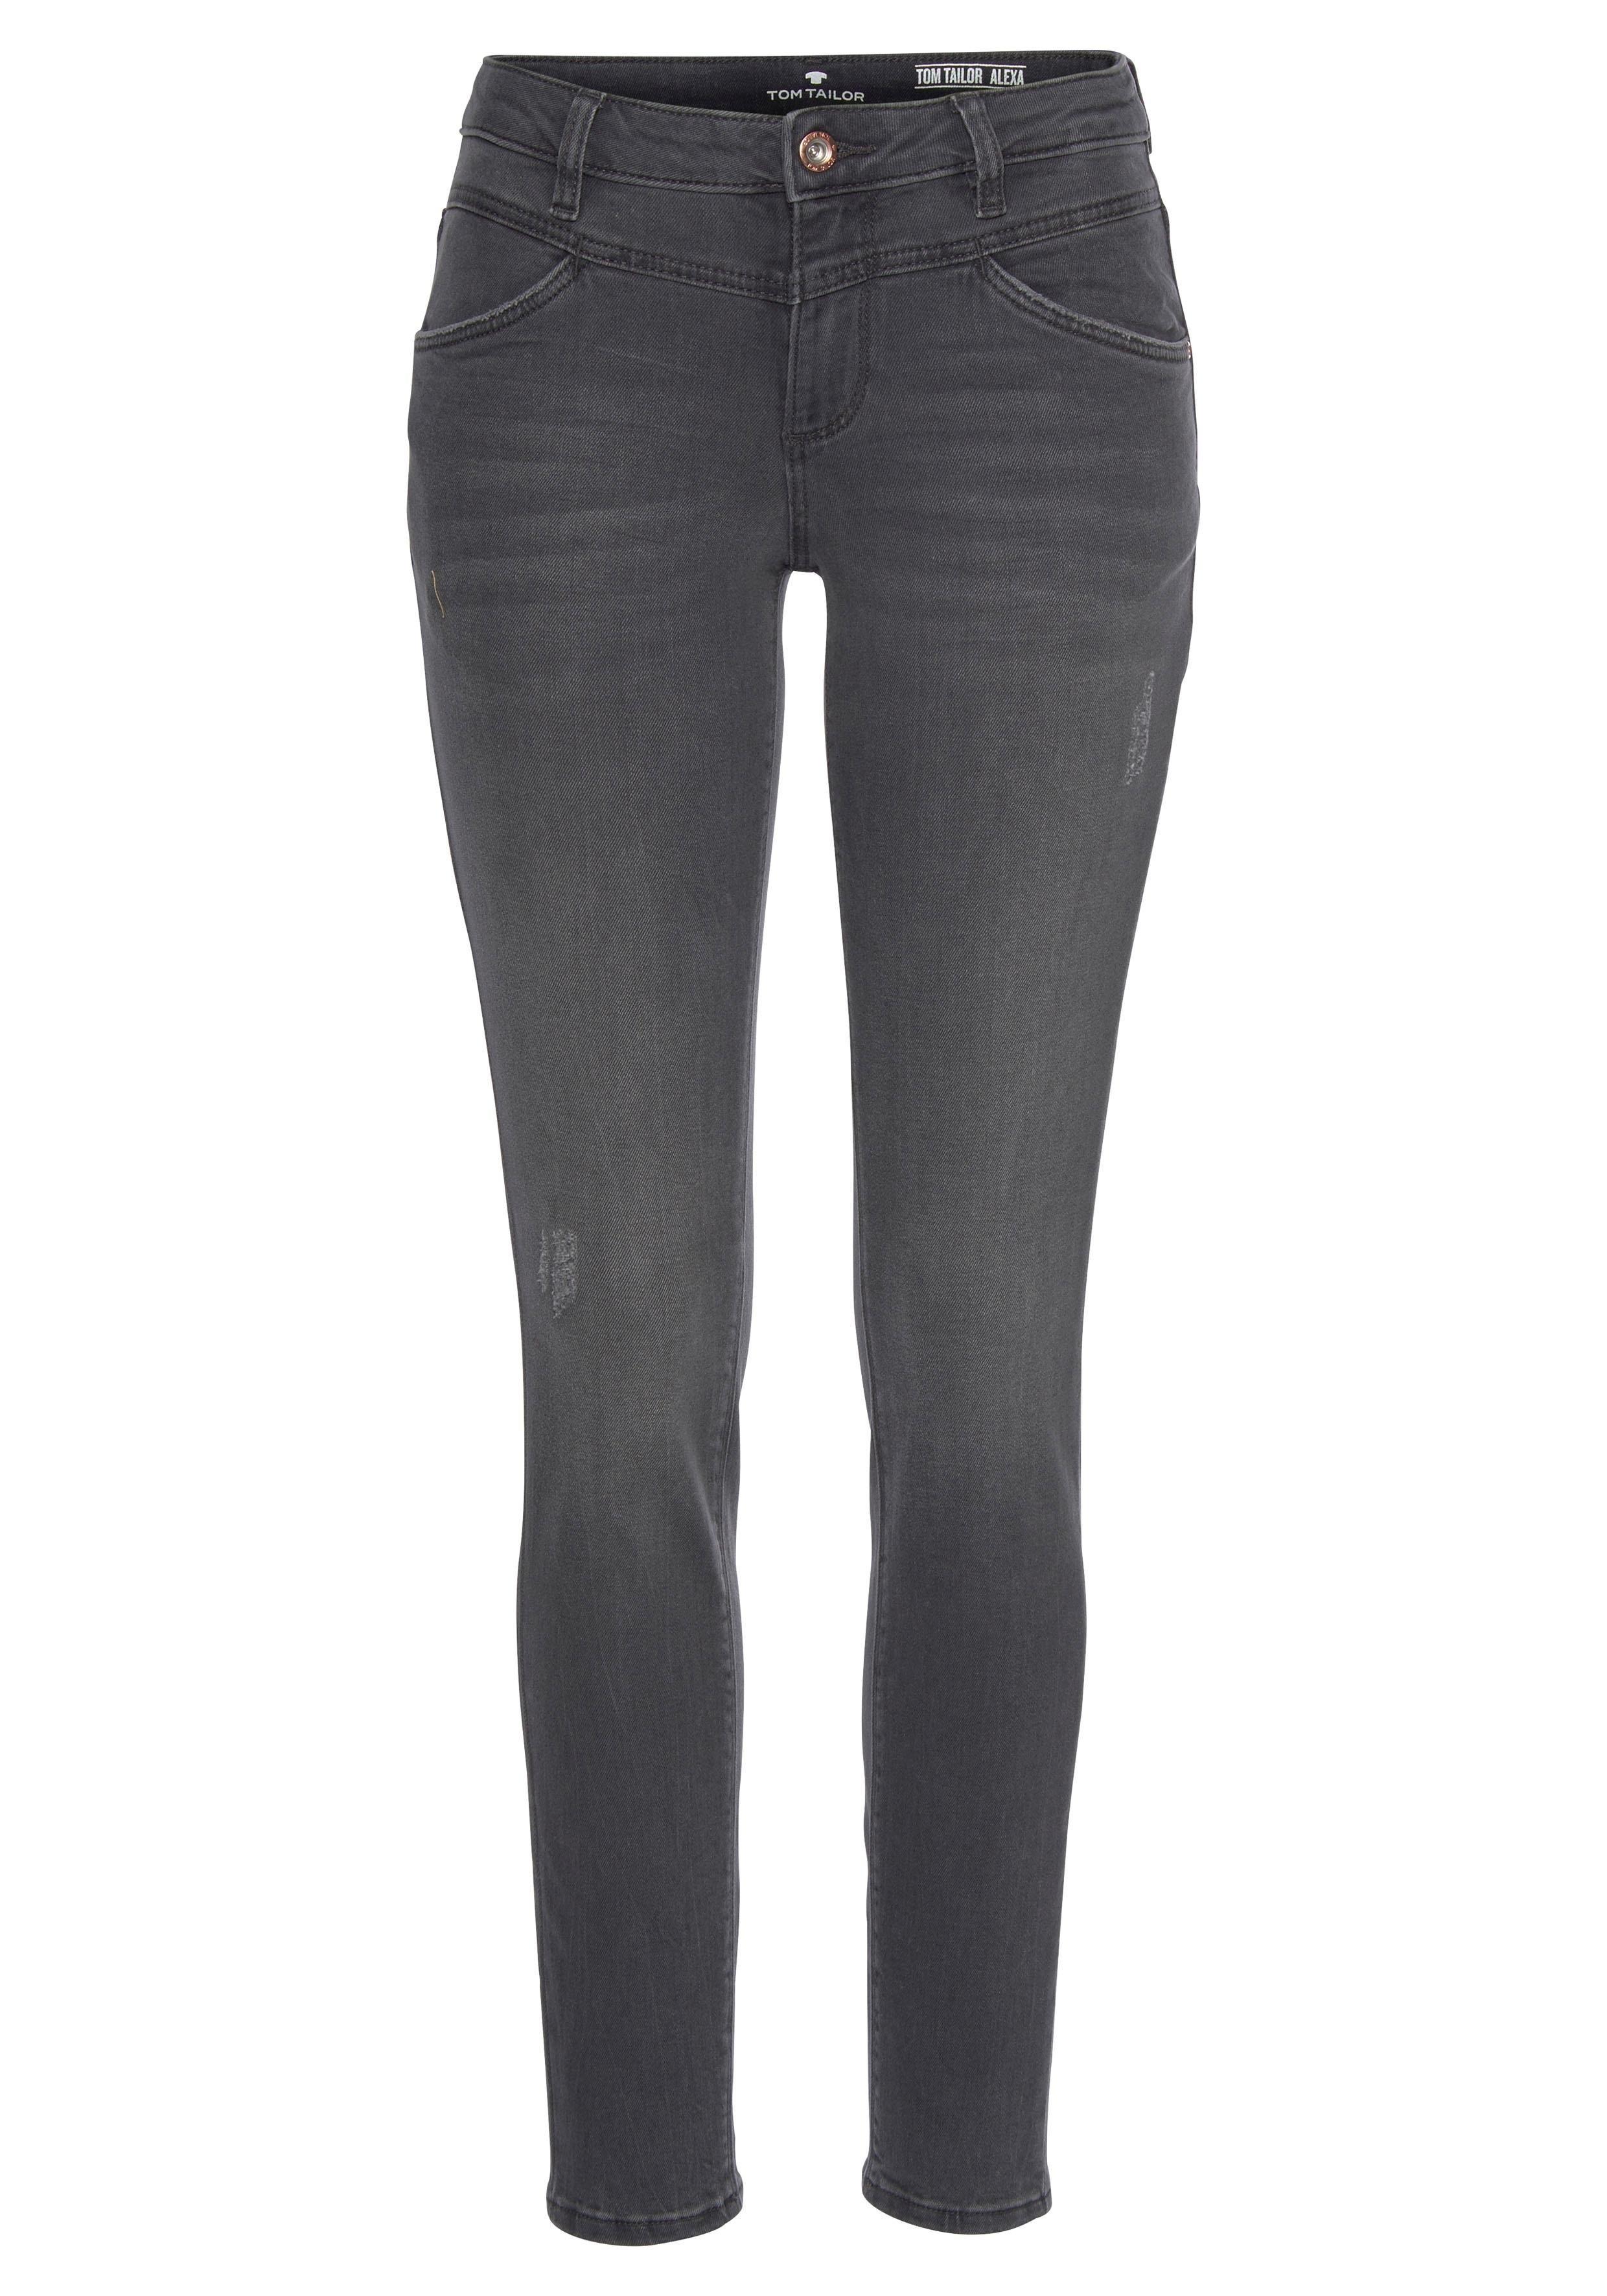 TOM TAILOR slim fit jeans »Alexa Skinny« - verschillende betaalmethodes